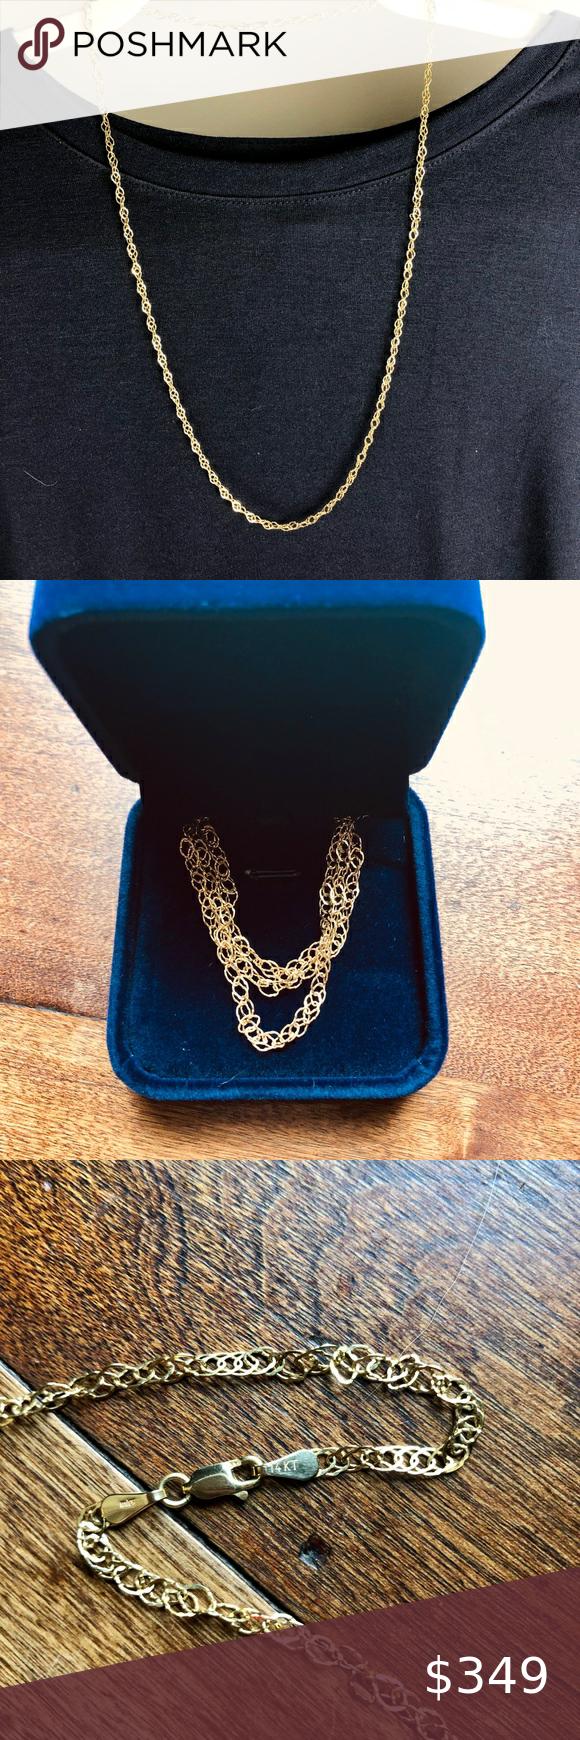 Milor 26 14k Italian Gold Necklace Unique Necklaces Womens Jewelry Necklace Necklace